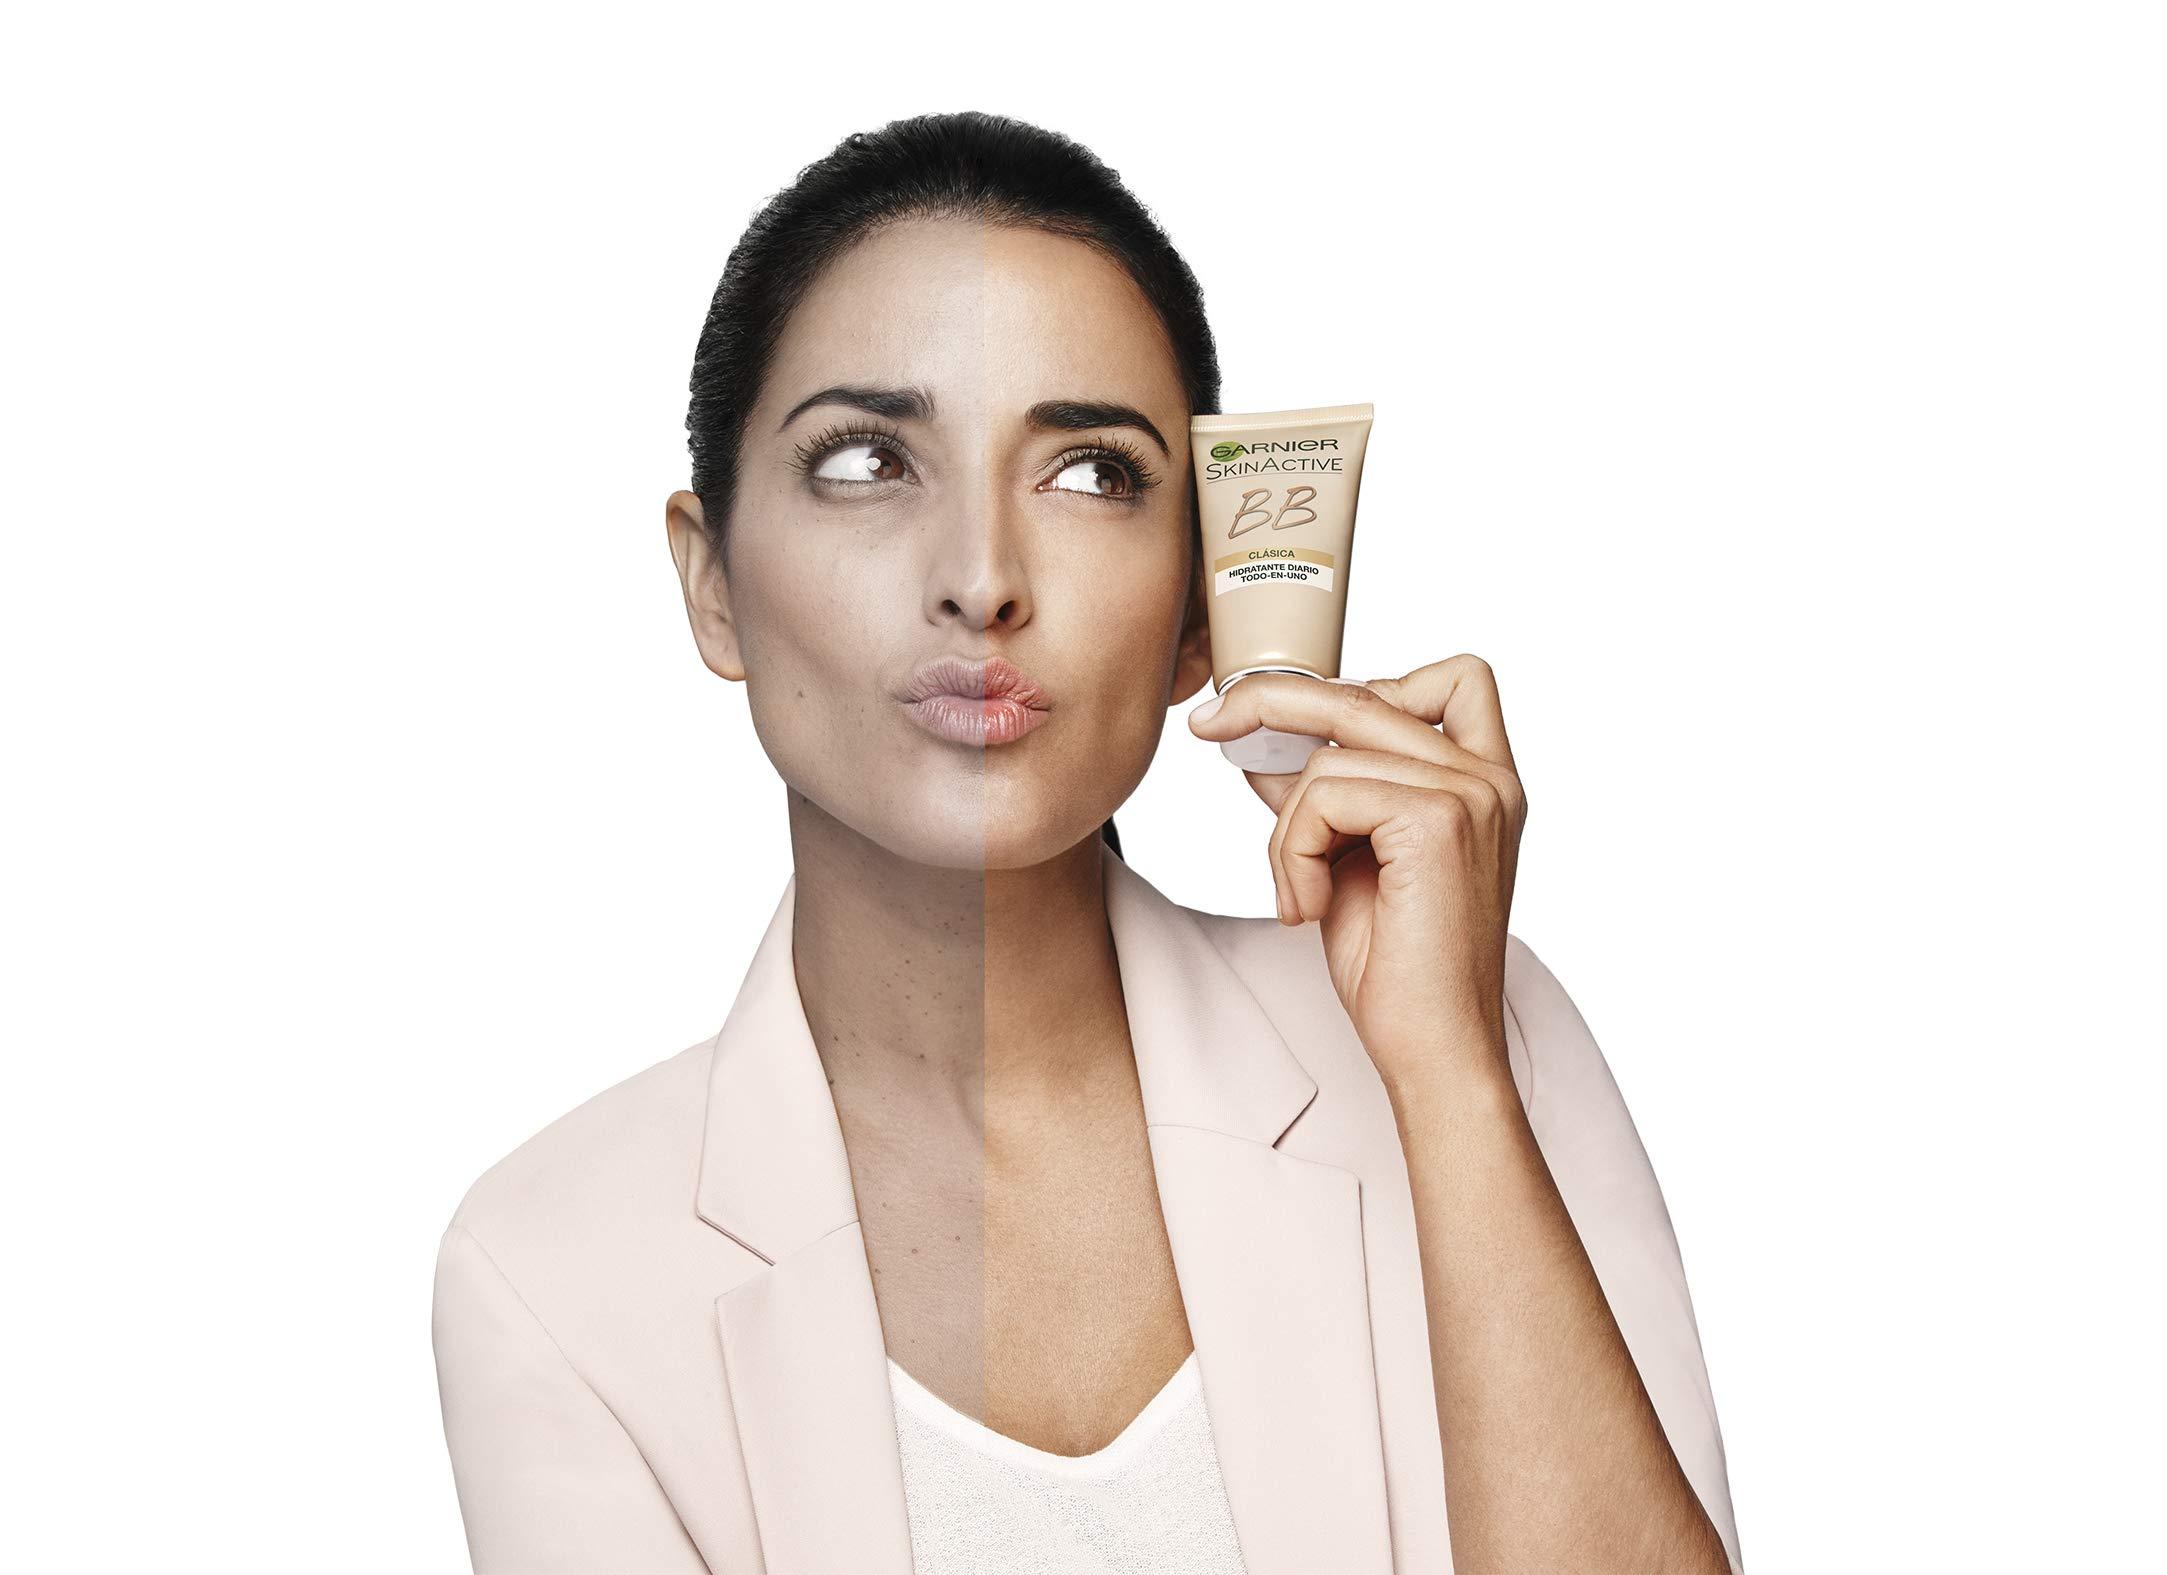 Garnier Skinactive Bb Cream Nude Perfeccionador Prodigioso para Pieles Normales Spf15 con Vitamina C – 50 ml